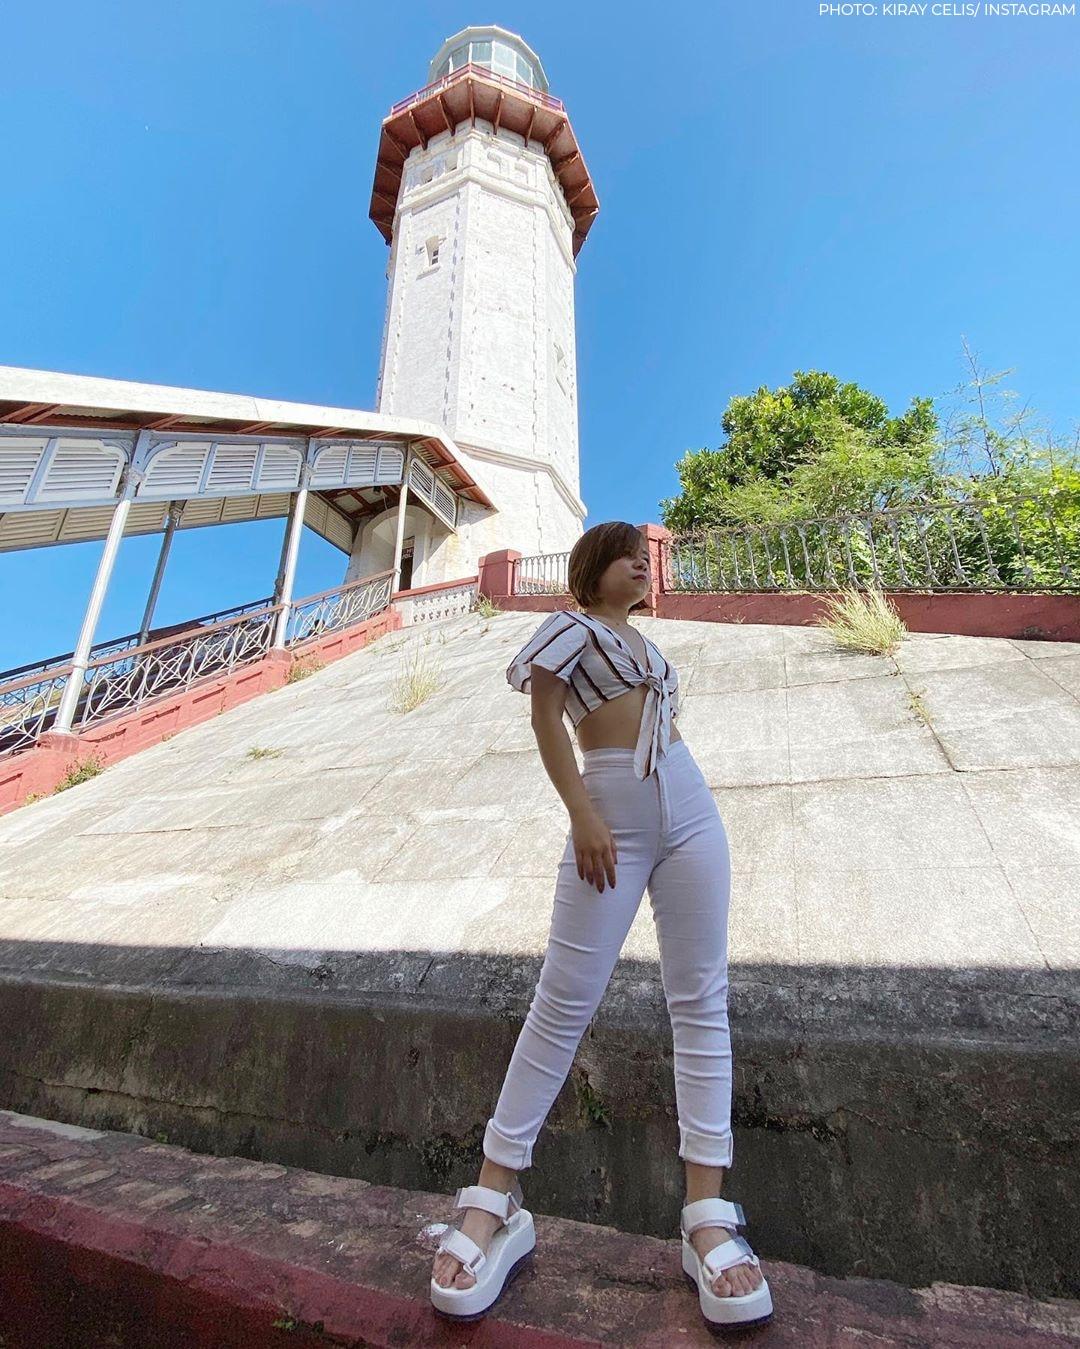 Kiray Celis' sizzling hot photos!